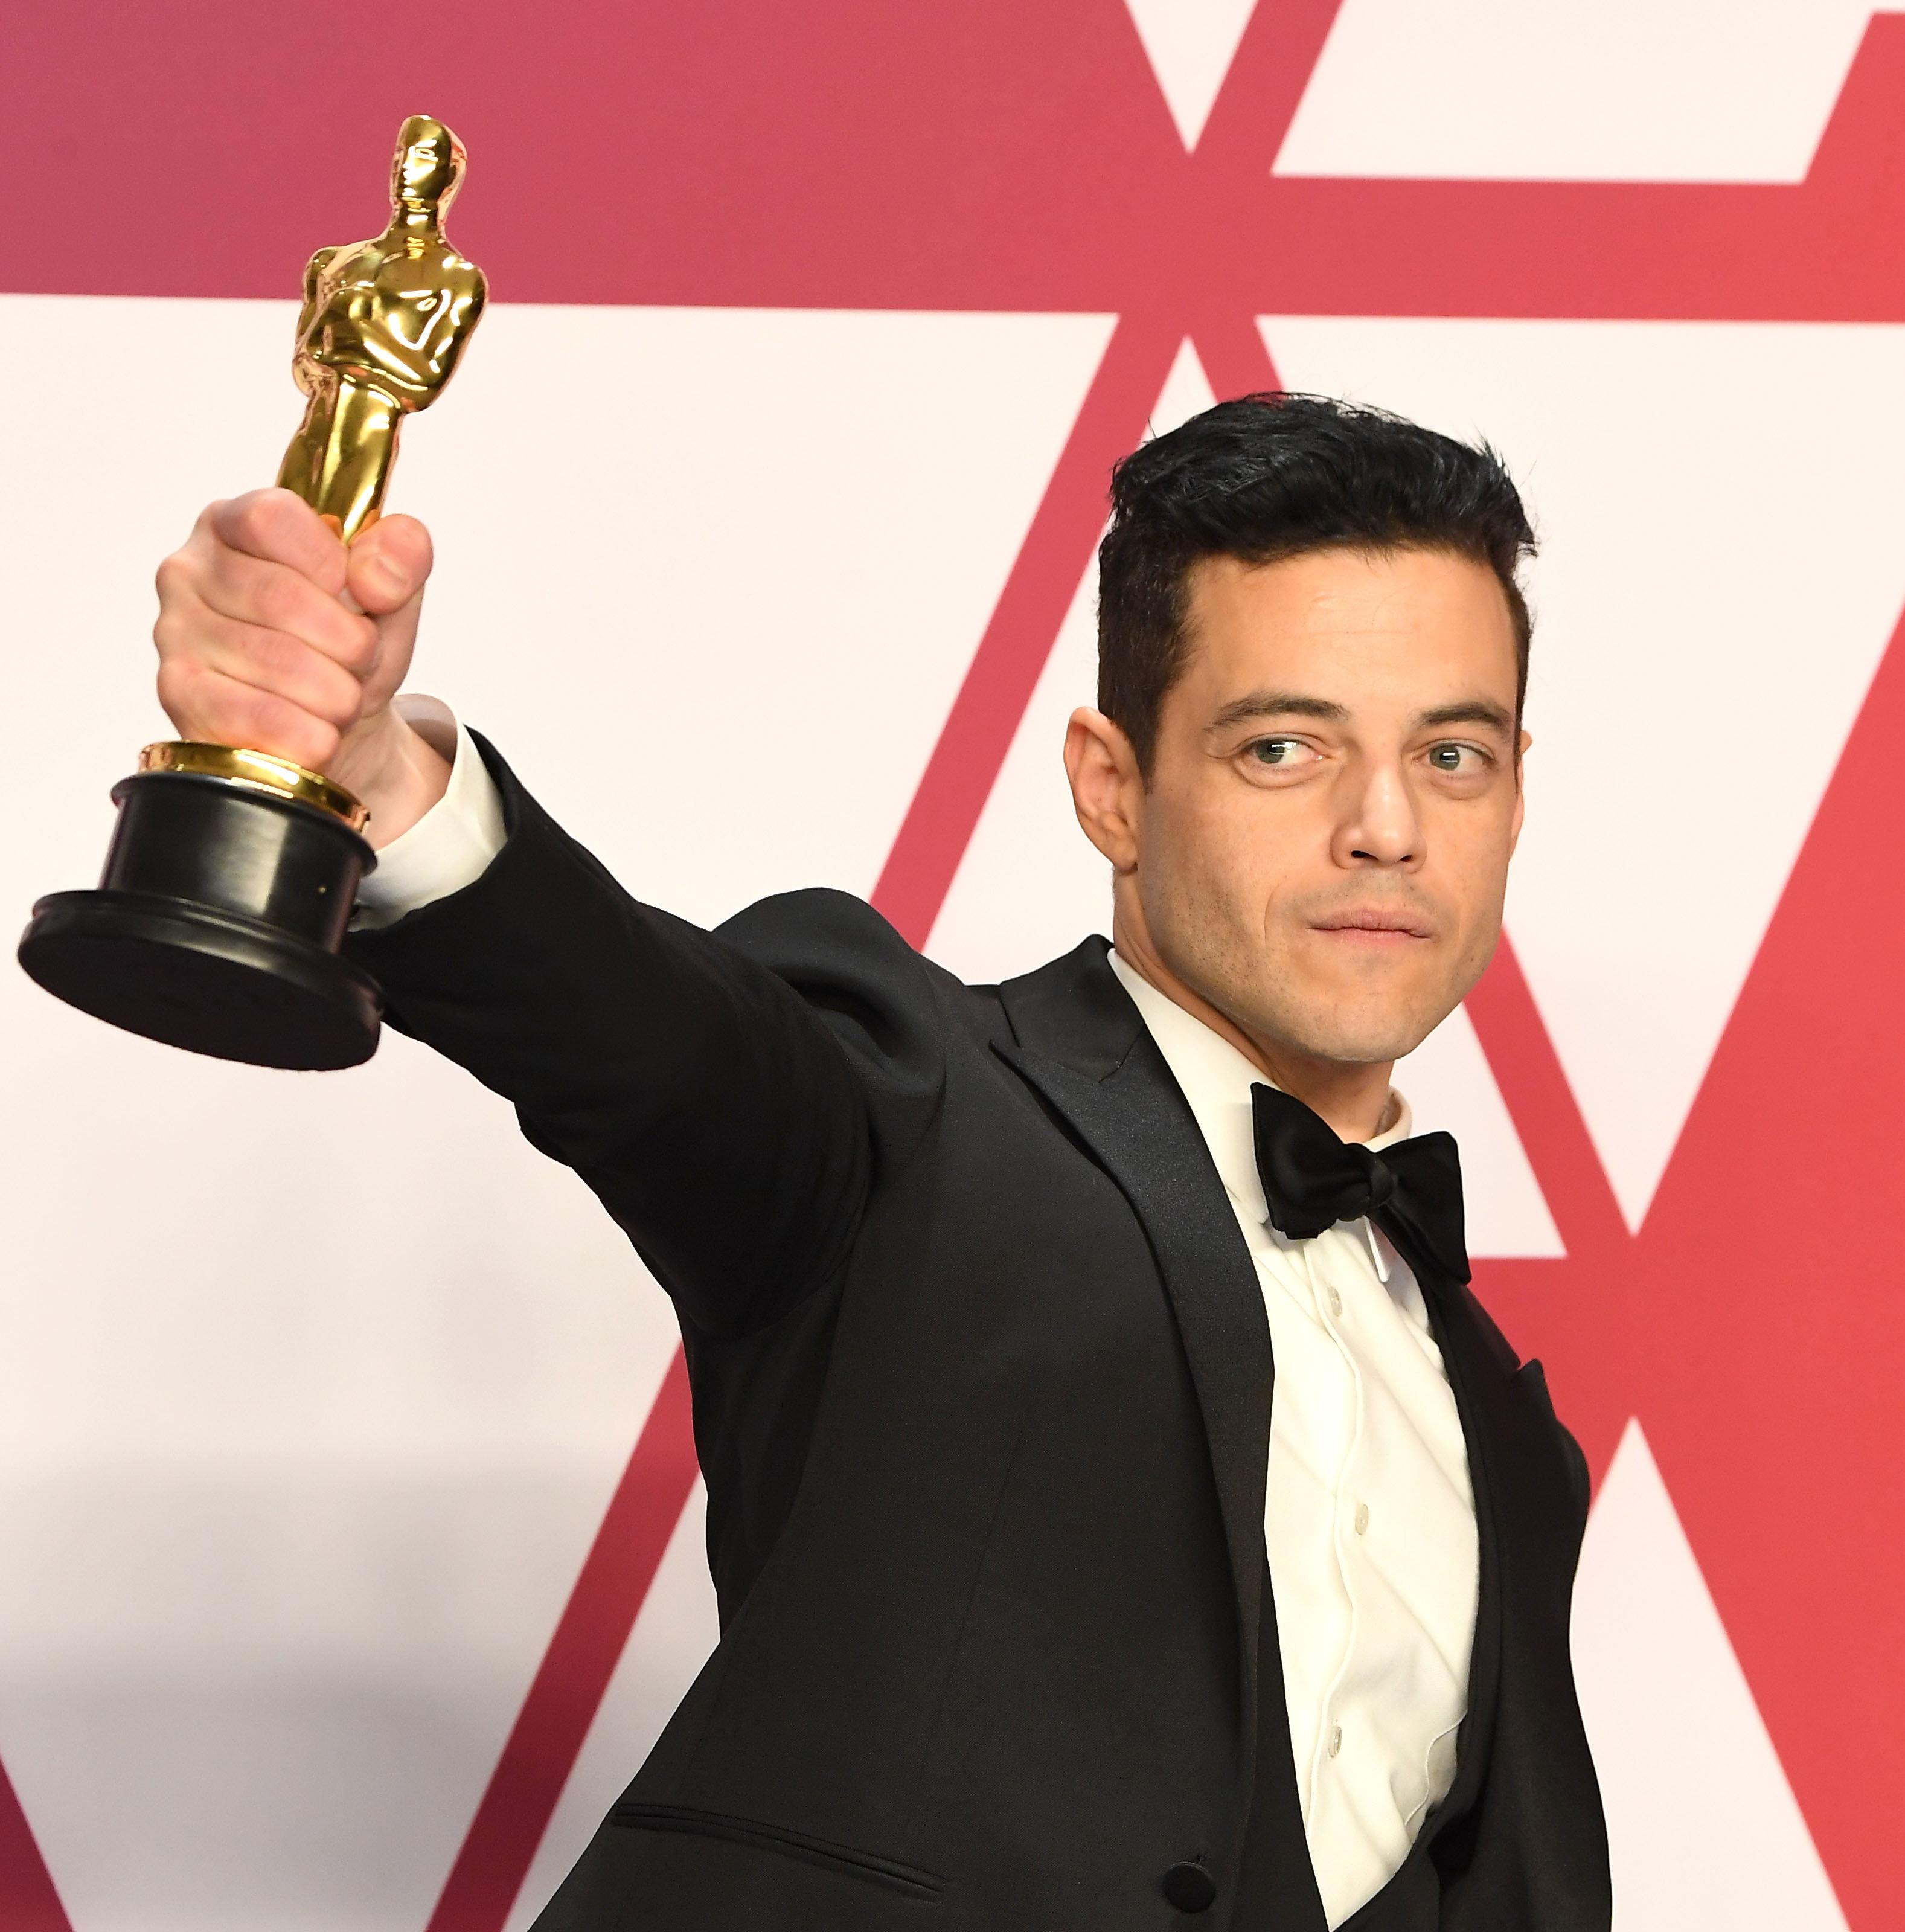 Rami Malek poses with his Oscar after the Academy Awards on Sunday.